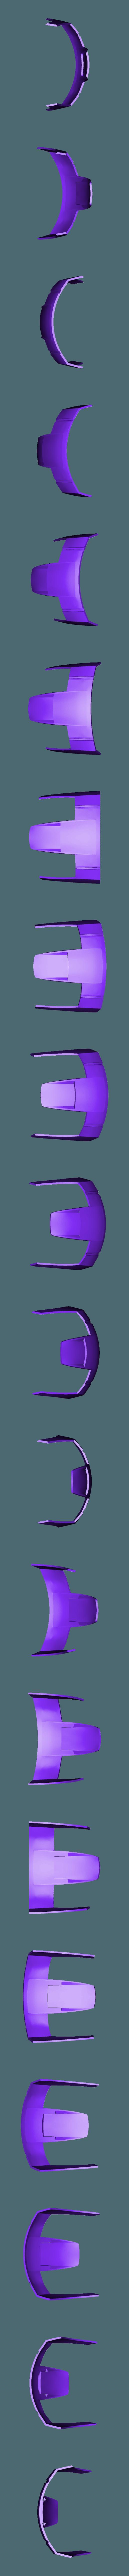 KF_helmet4-1.stl Download free STL file Iron Man Mark III Helmet Separated and Oriented • 3D printer template, KerseyFabrications